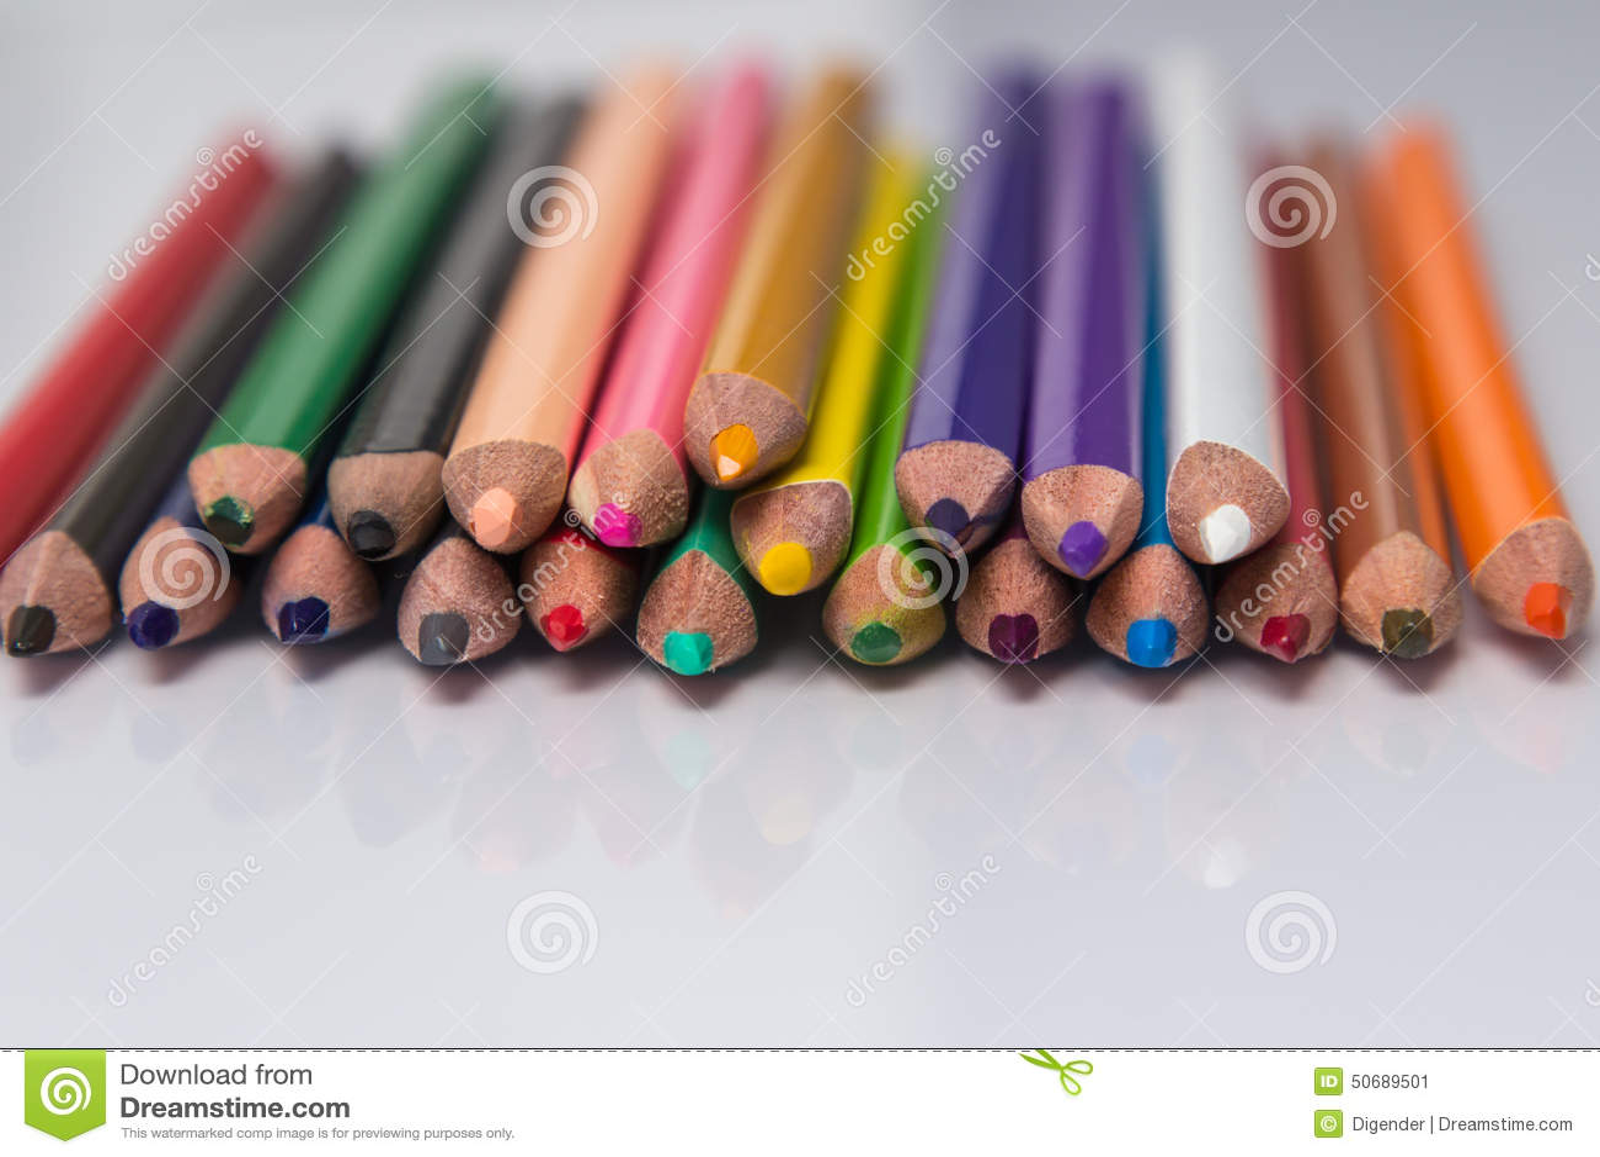 Download 五颜六色的铅笔蜡笔边界 库存图片. 图片 包括有 空白, 教育, 复制, 查出, 特写镜头, 油漆, 文字 - 50689501